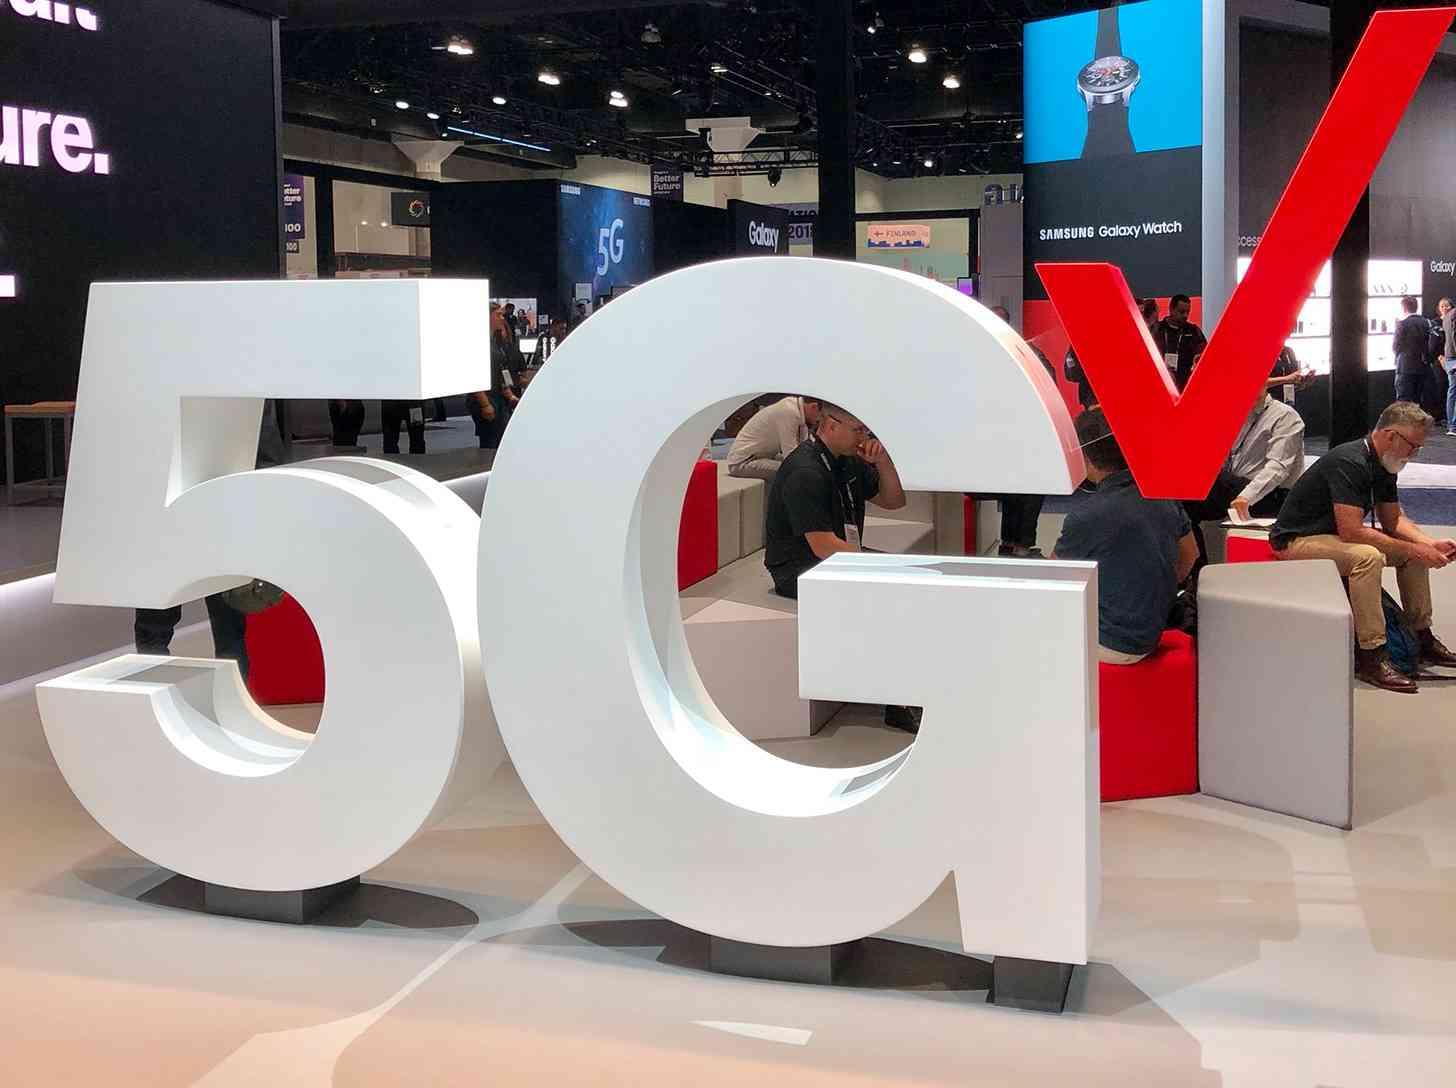 Verizon 5G goes live in 13 NFL stadiums | PhoneDog